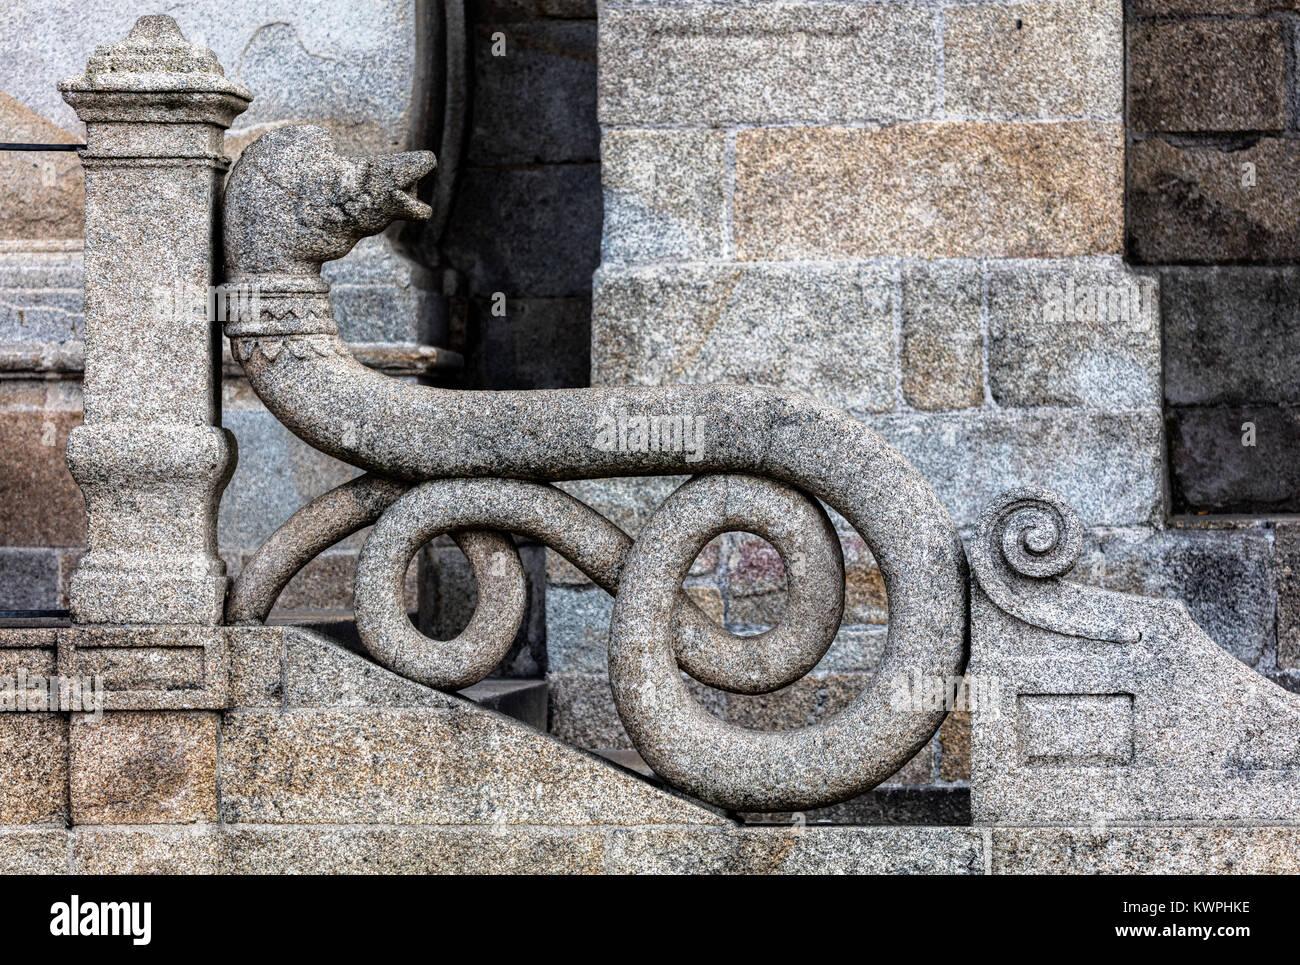 Medieval stone snake balustrade of the Porto cathedral in Porto, Portugal - Stock Image